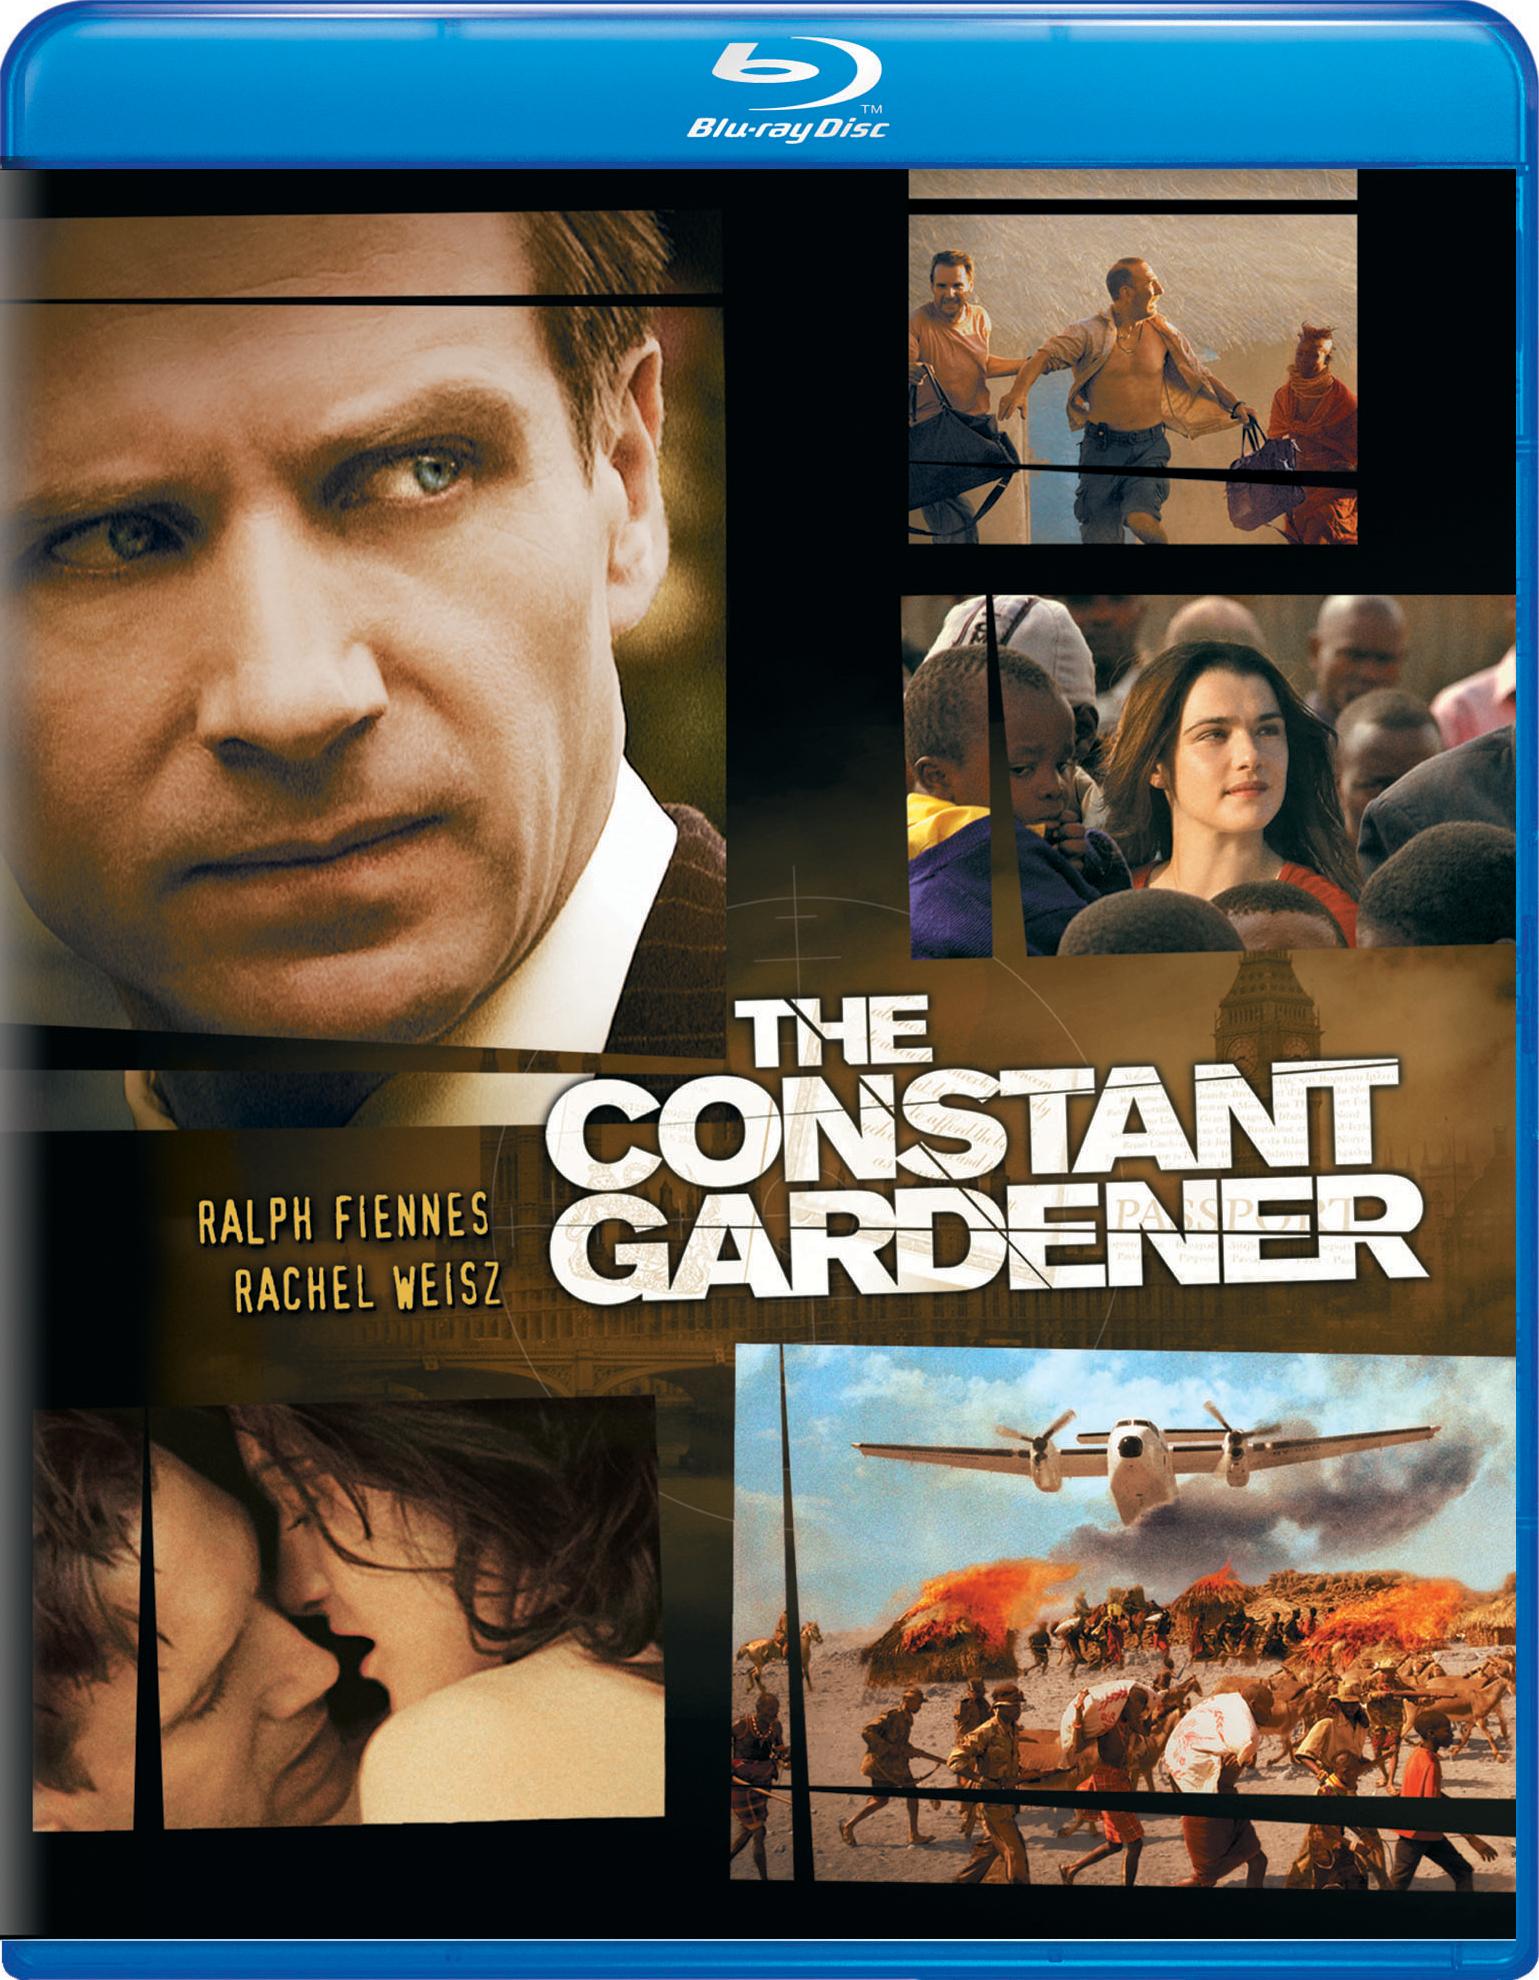 The Constant Gardener Blu-ray